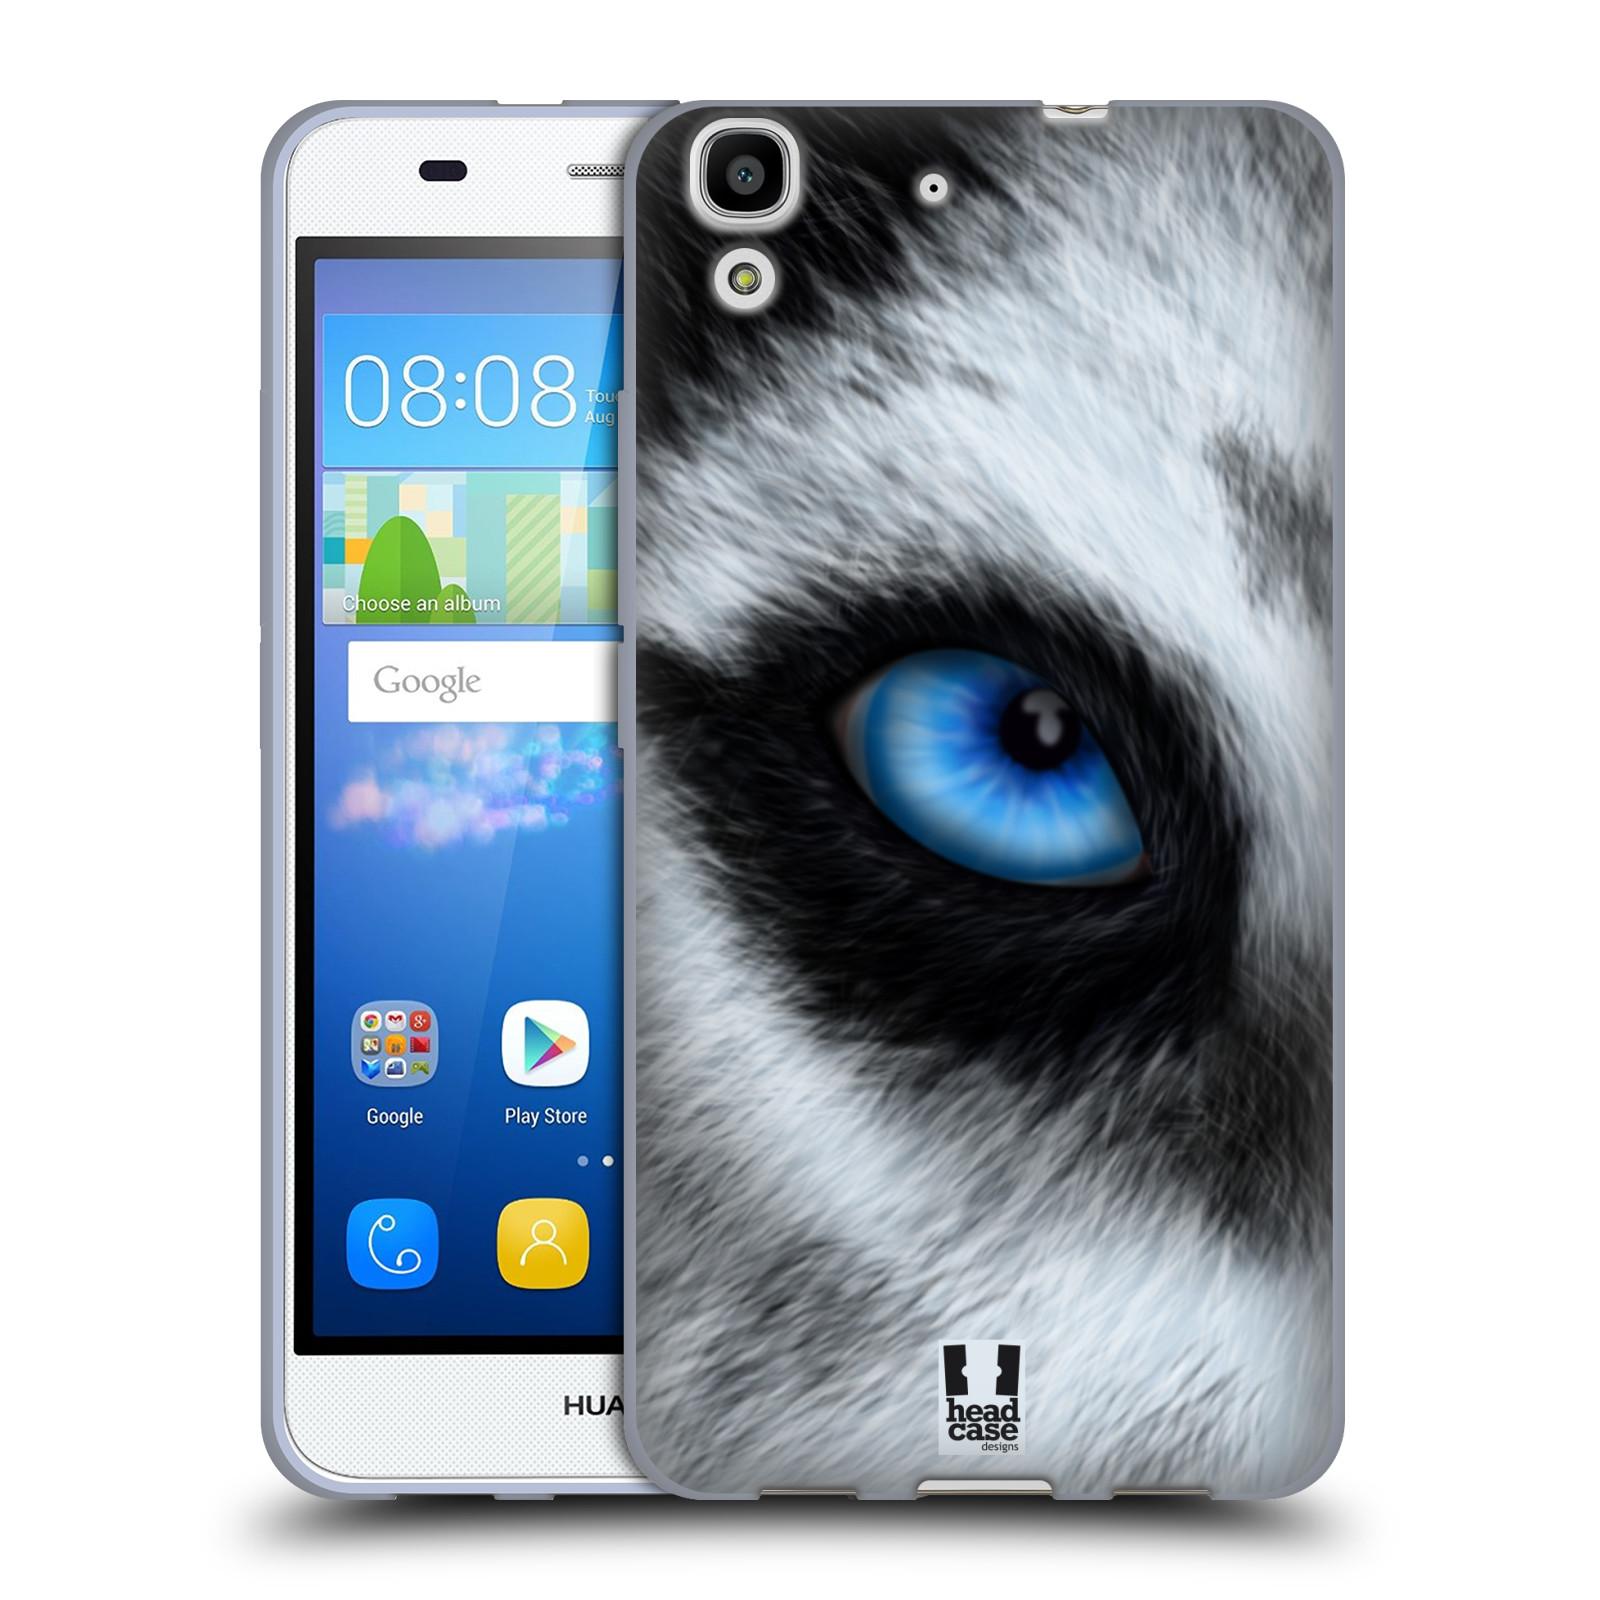 HEAD CASE silikonový obal na mobil HUAWEI Y6 vzor pohled zvířete oko pes husky